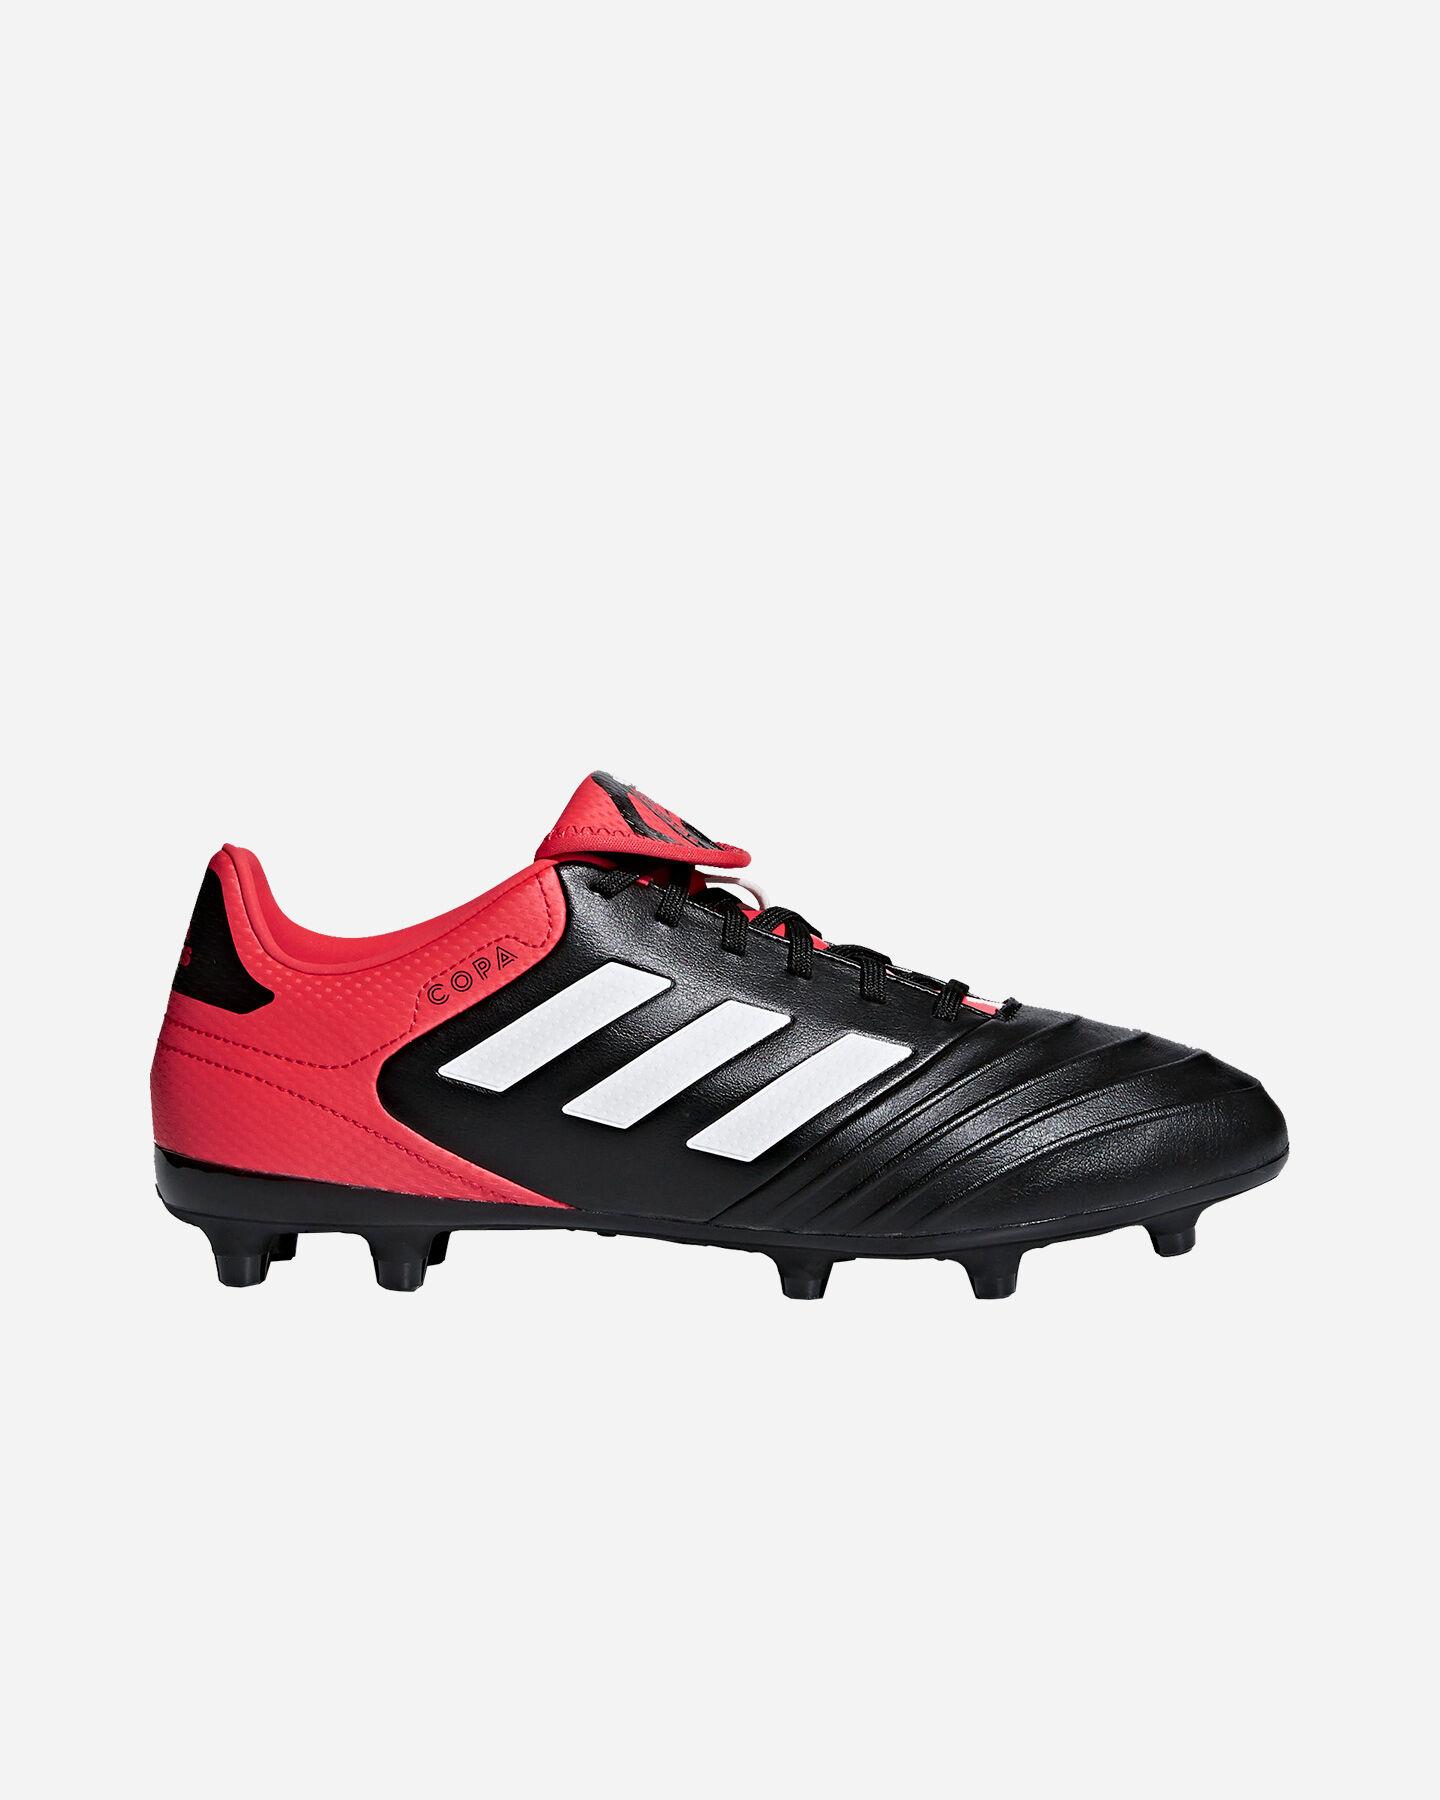 Sport 18 Su Scarpe Copa Adidas 3 Fg Cisalfa Calcio M Cp8957 O5vwZqwAx